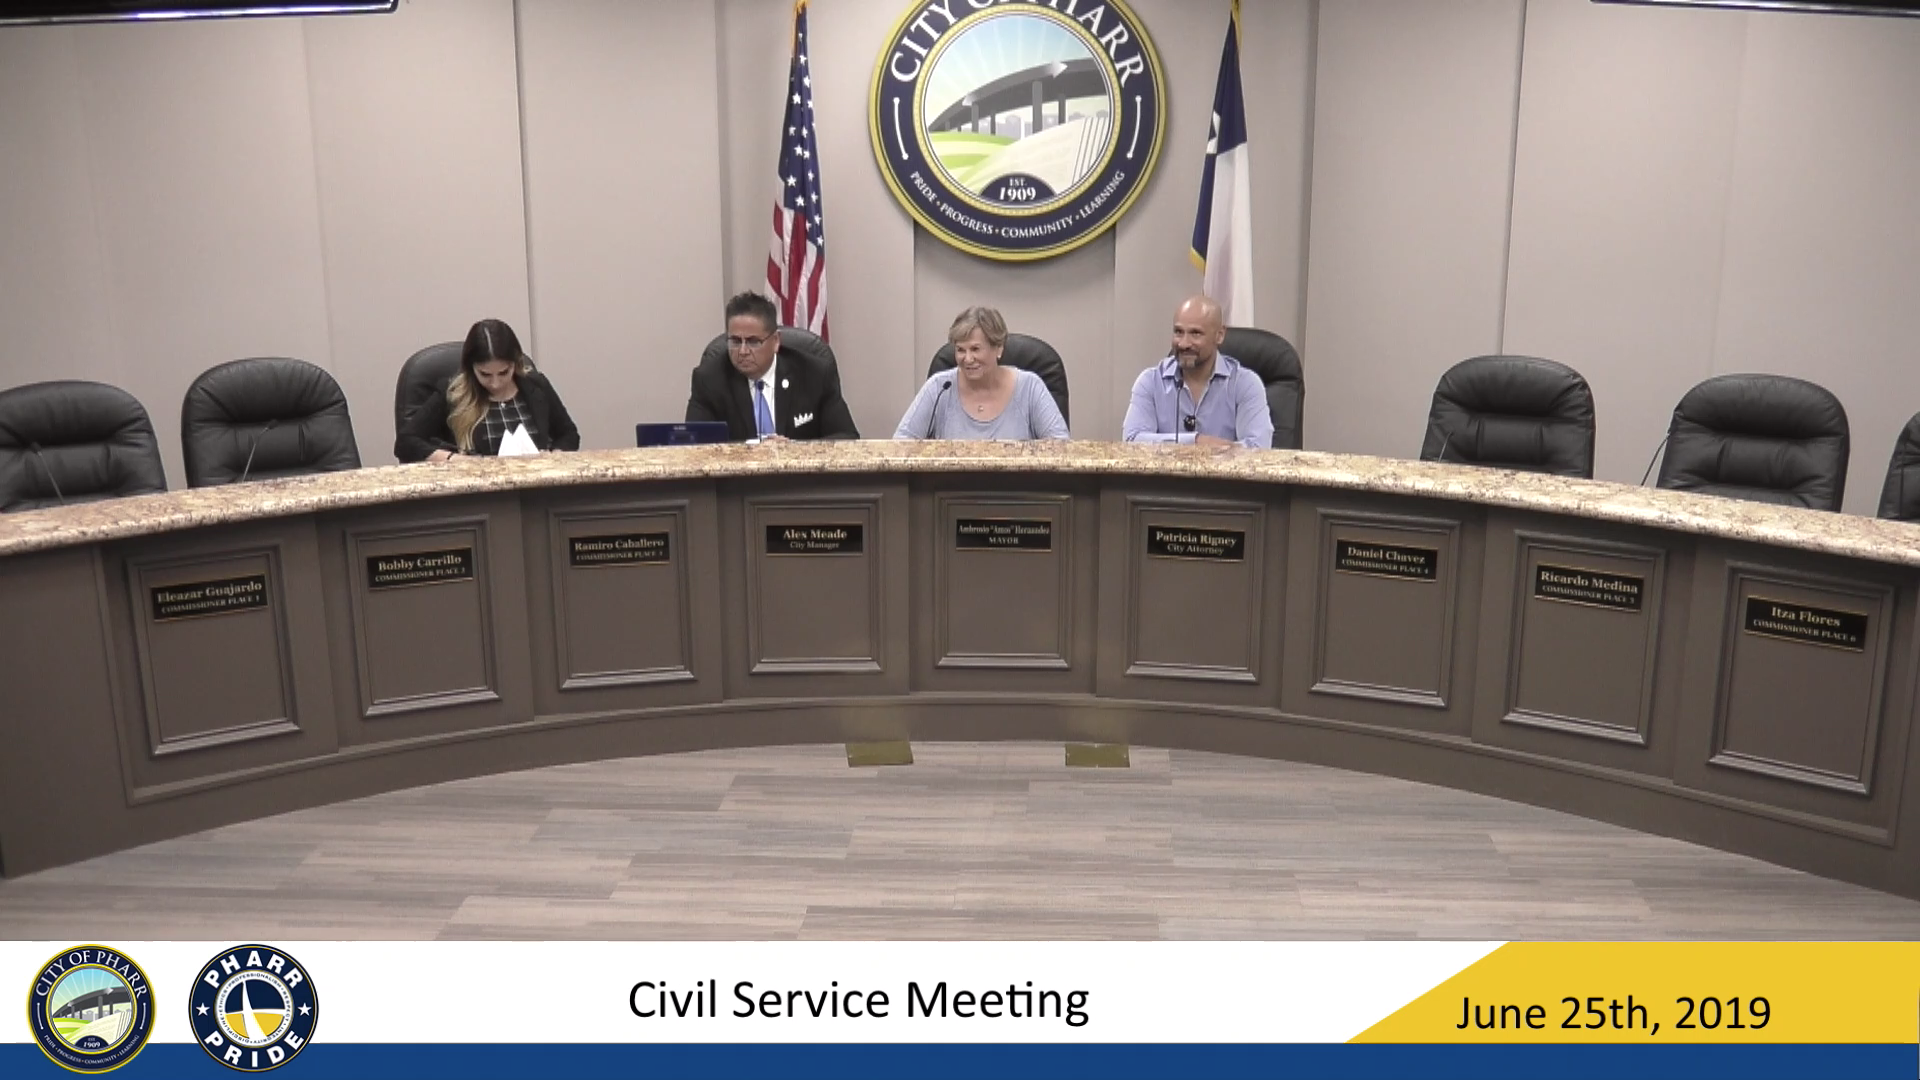 Civil Service Board Meeting – June 25th, 2019